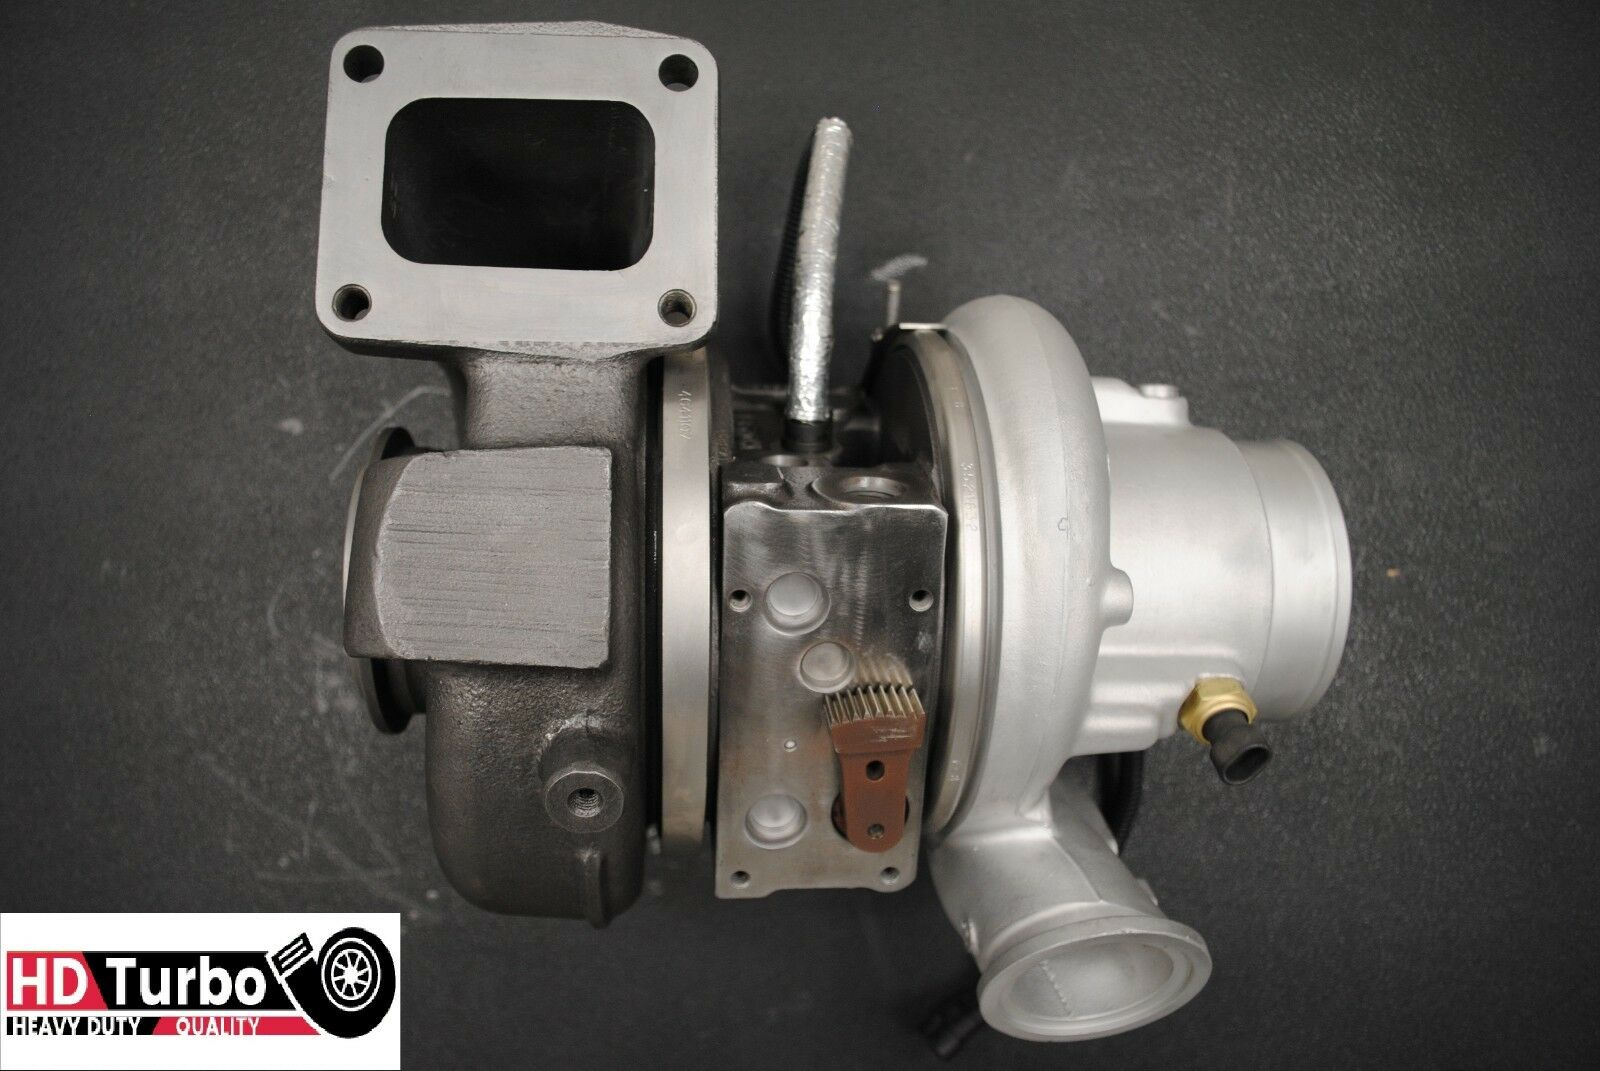 Holset Turbo 2882111RX Cummins ISX Turbocharger 3773562 Semi Truck HE400VG  Volvo   Shopping Bin - Search eBay faster